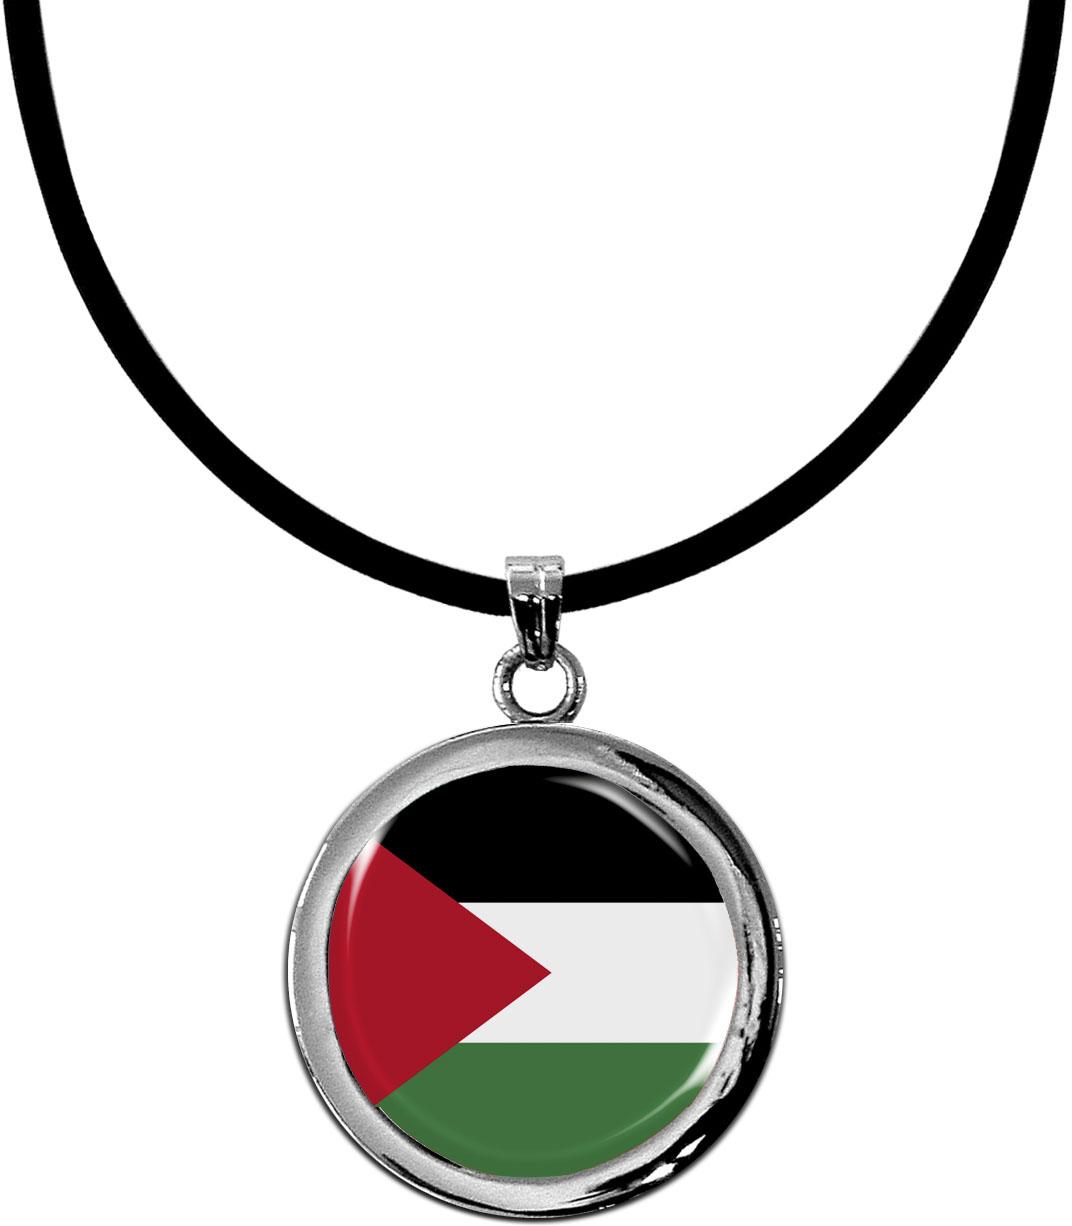 Kettenanhänger / Palästina / Silikonband mit Silberverschluss